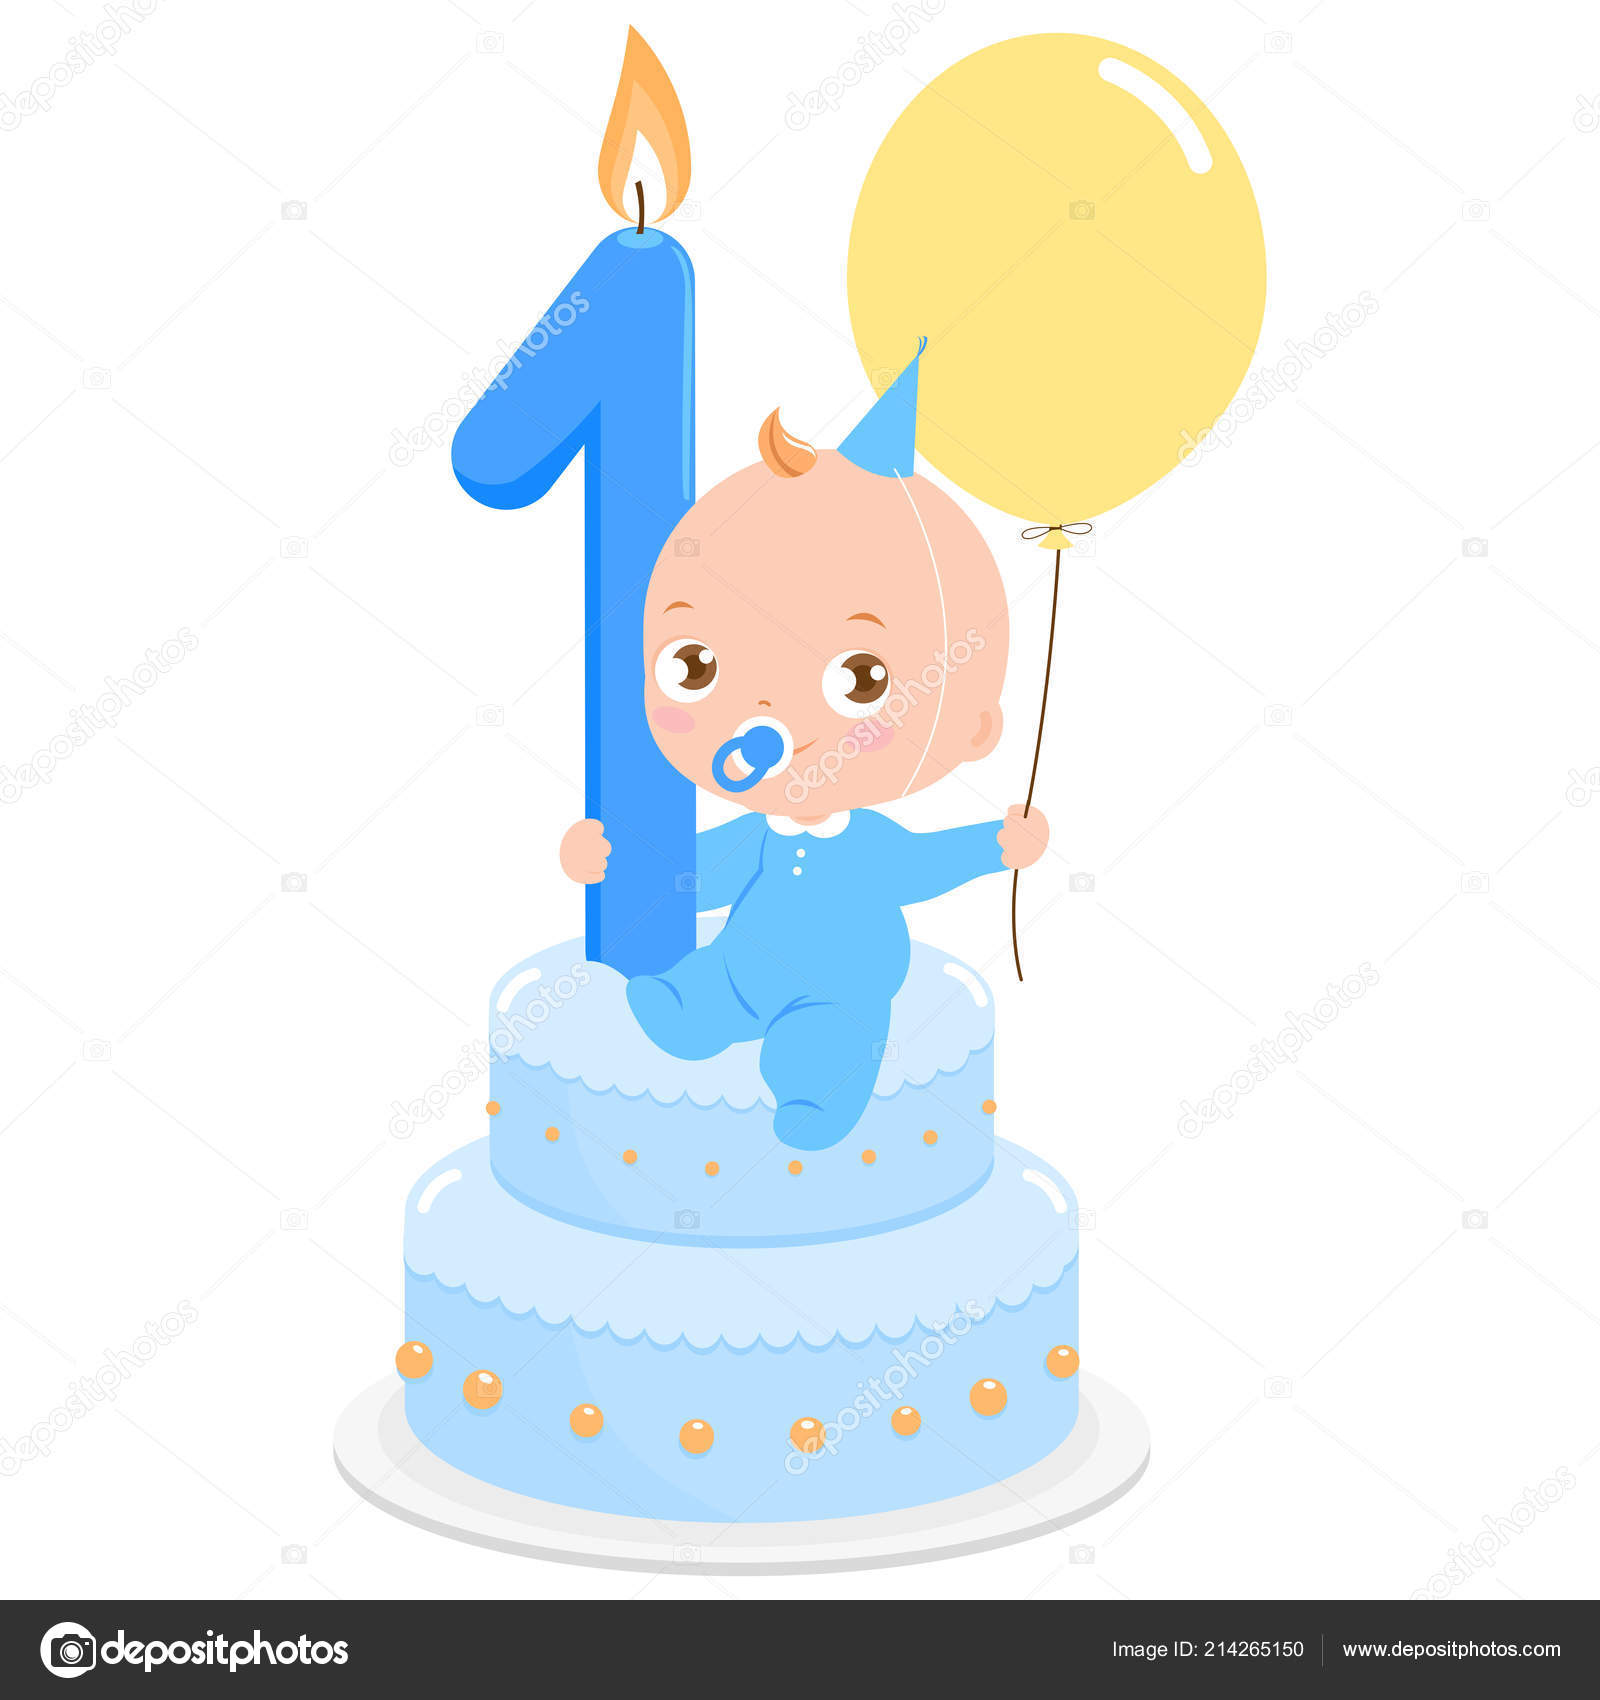 Astounding Baby Boy Birthday Cake Celebrating His First Birthday Holding Funny Birthday Cards Online Inifodamsfinfo